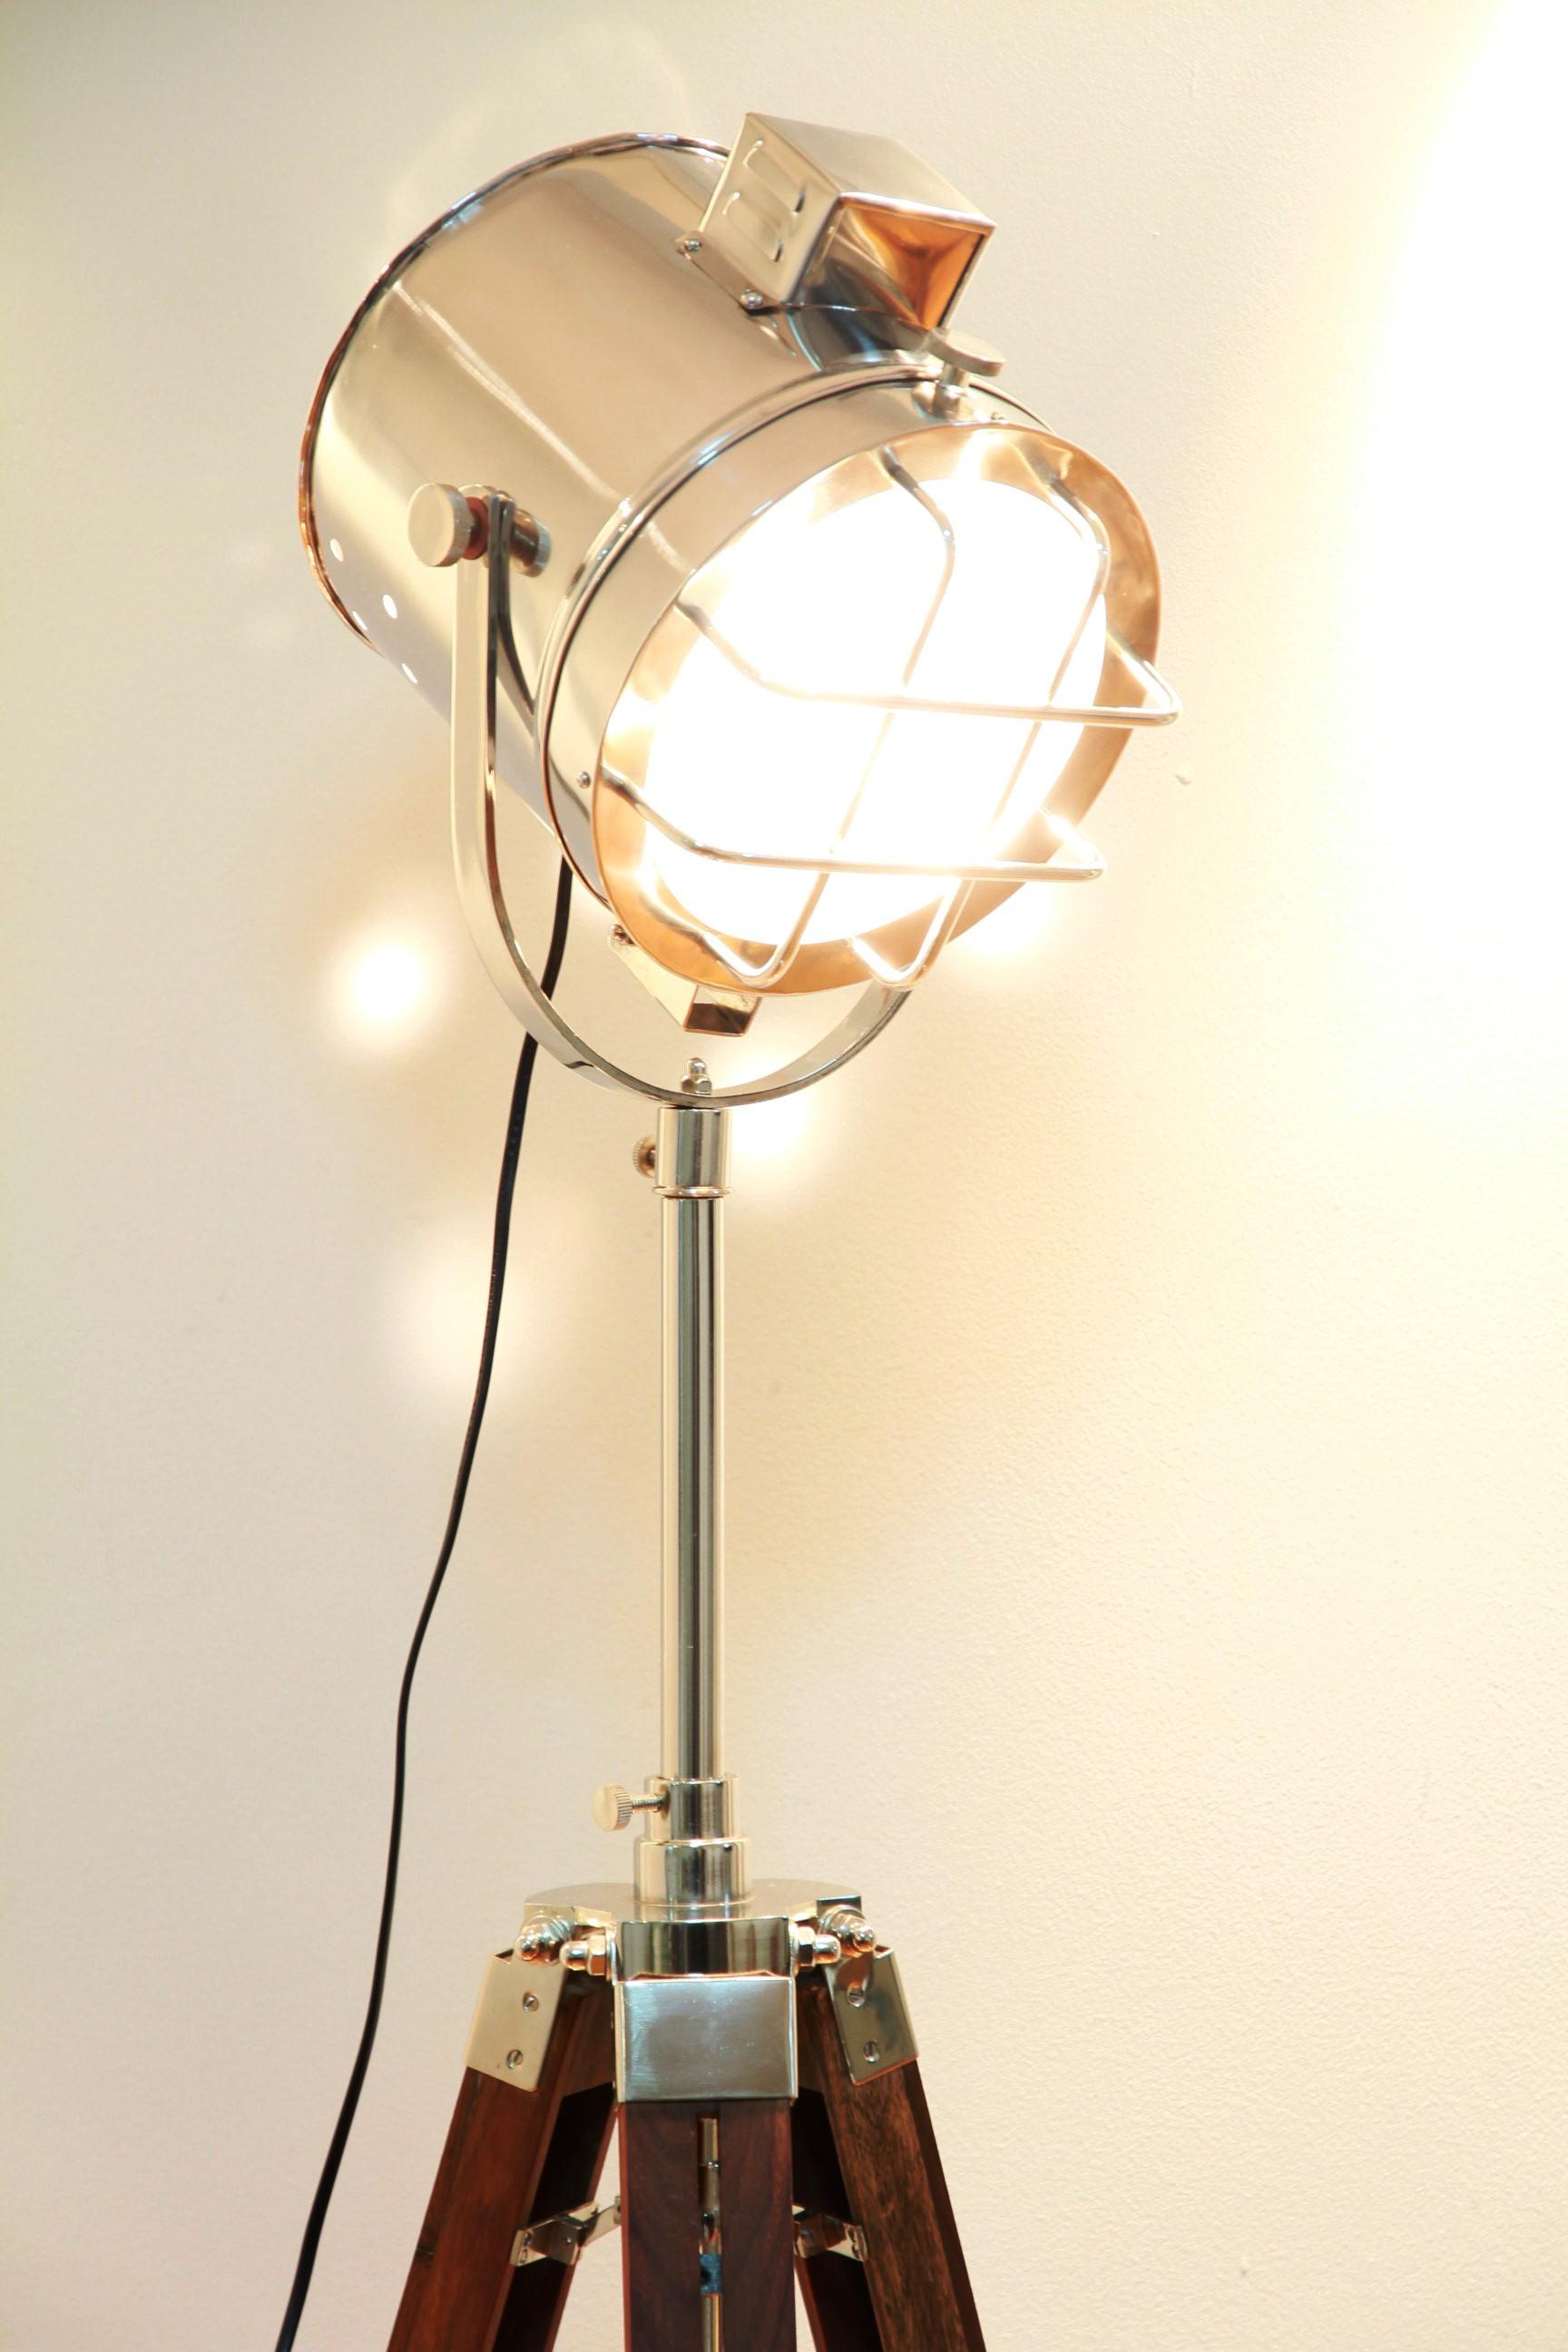 Vintage floor lamps - Source Of Purification Vintage Industrial Floor Lamps